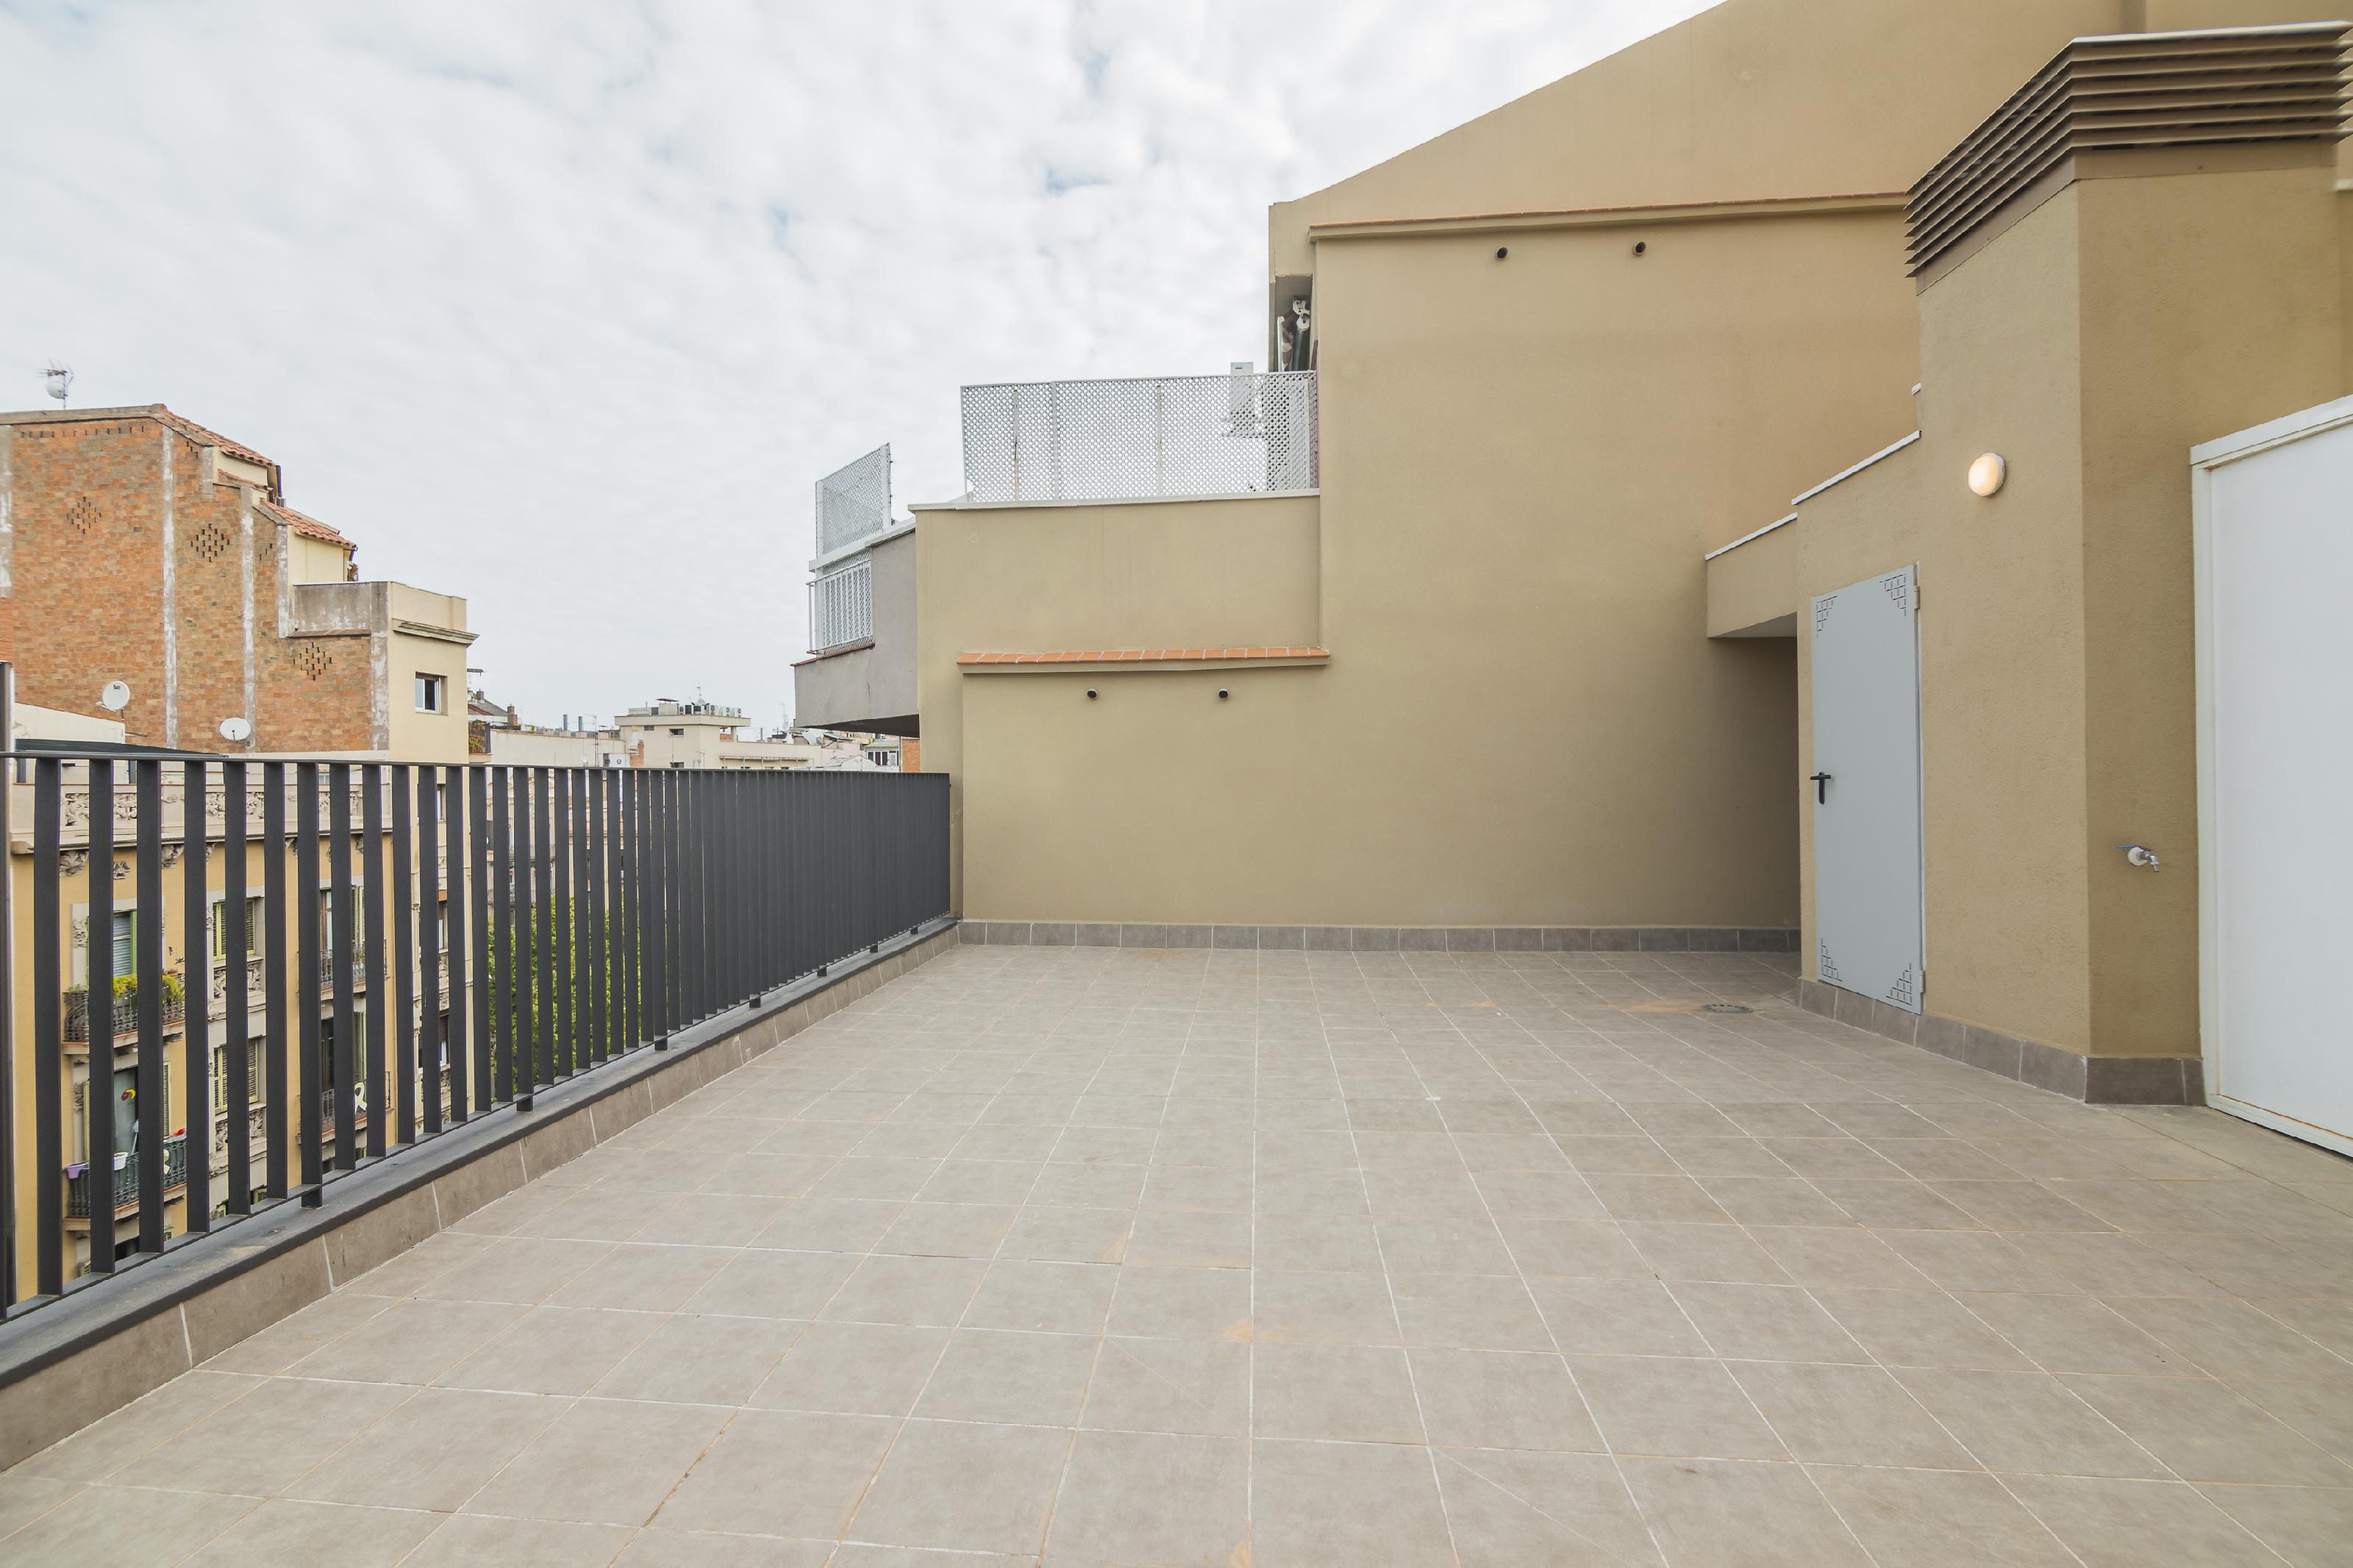 248734 Flat for sale in Eixample, Nova Esquerra Eixample 24